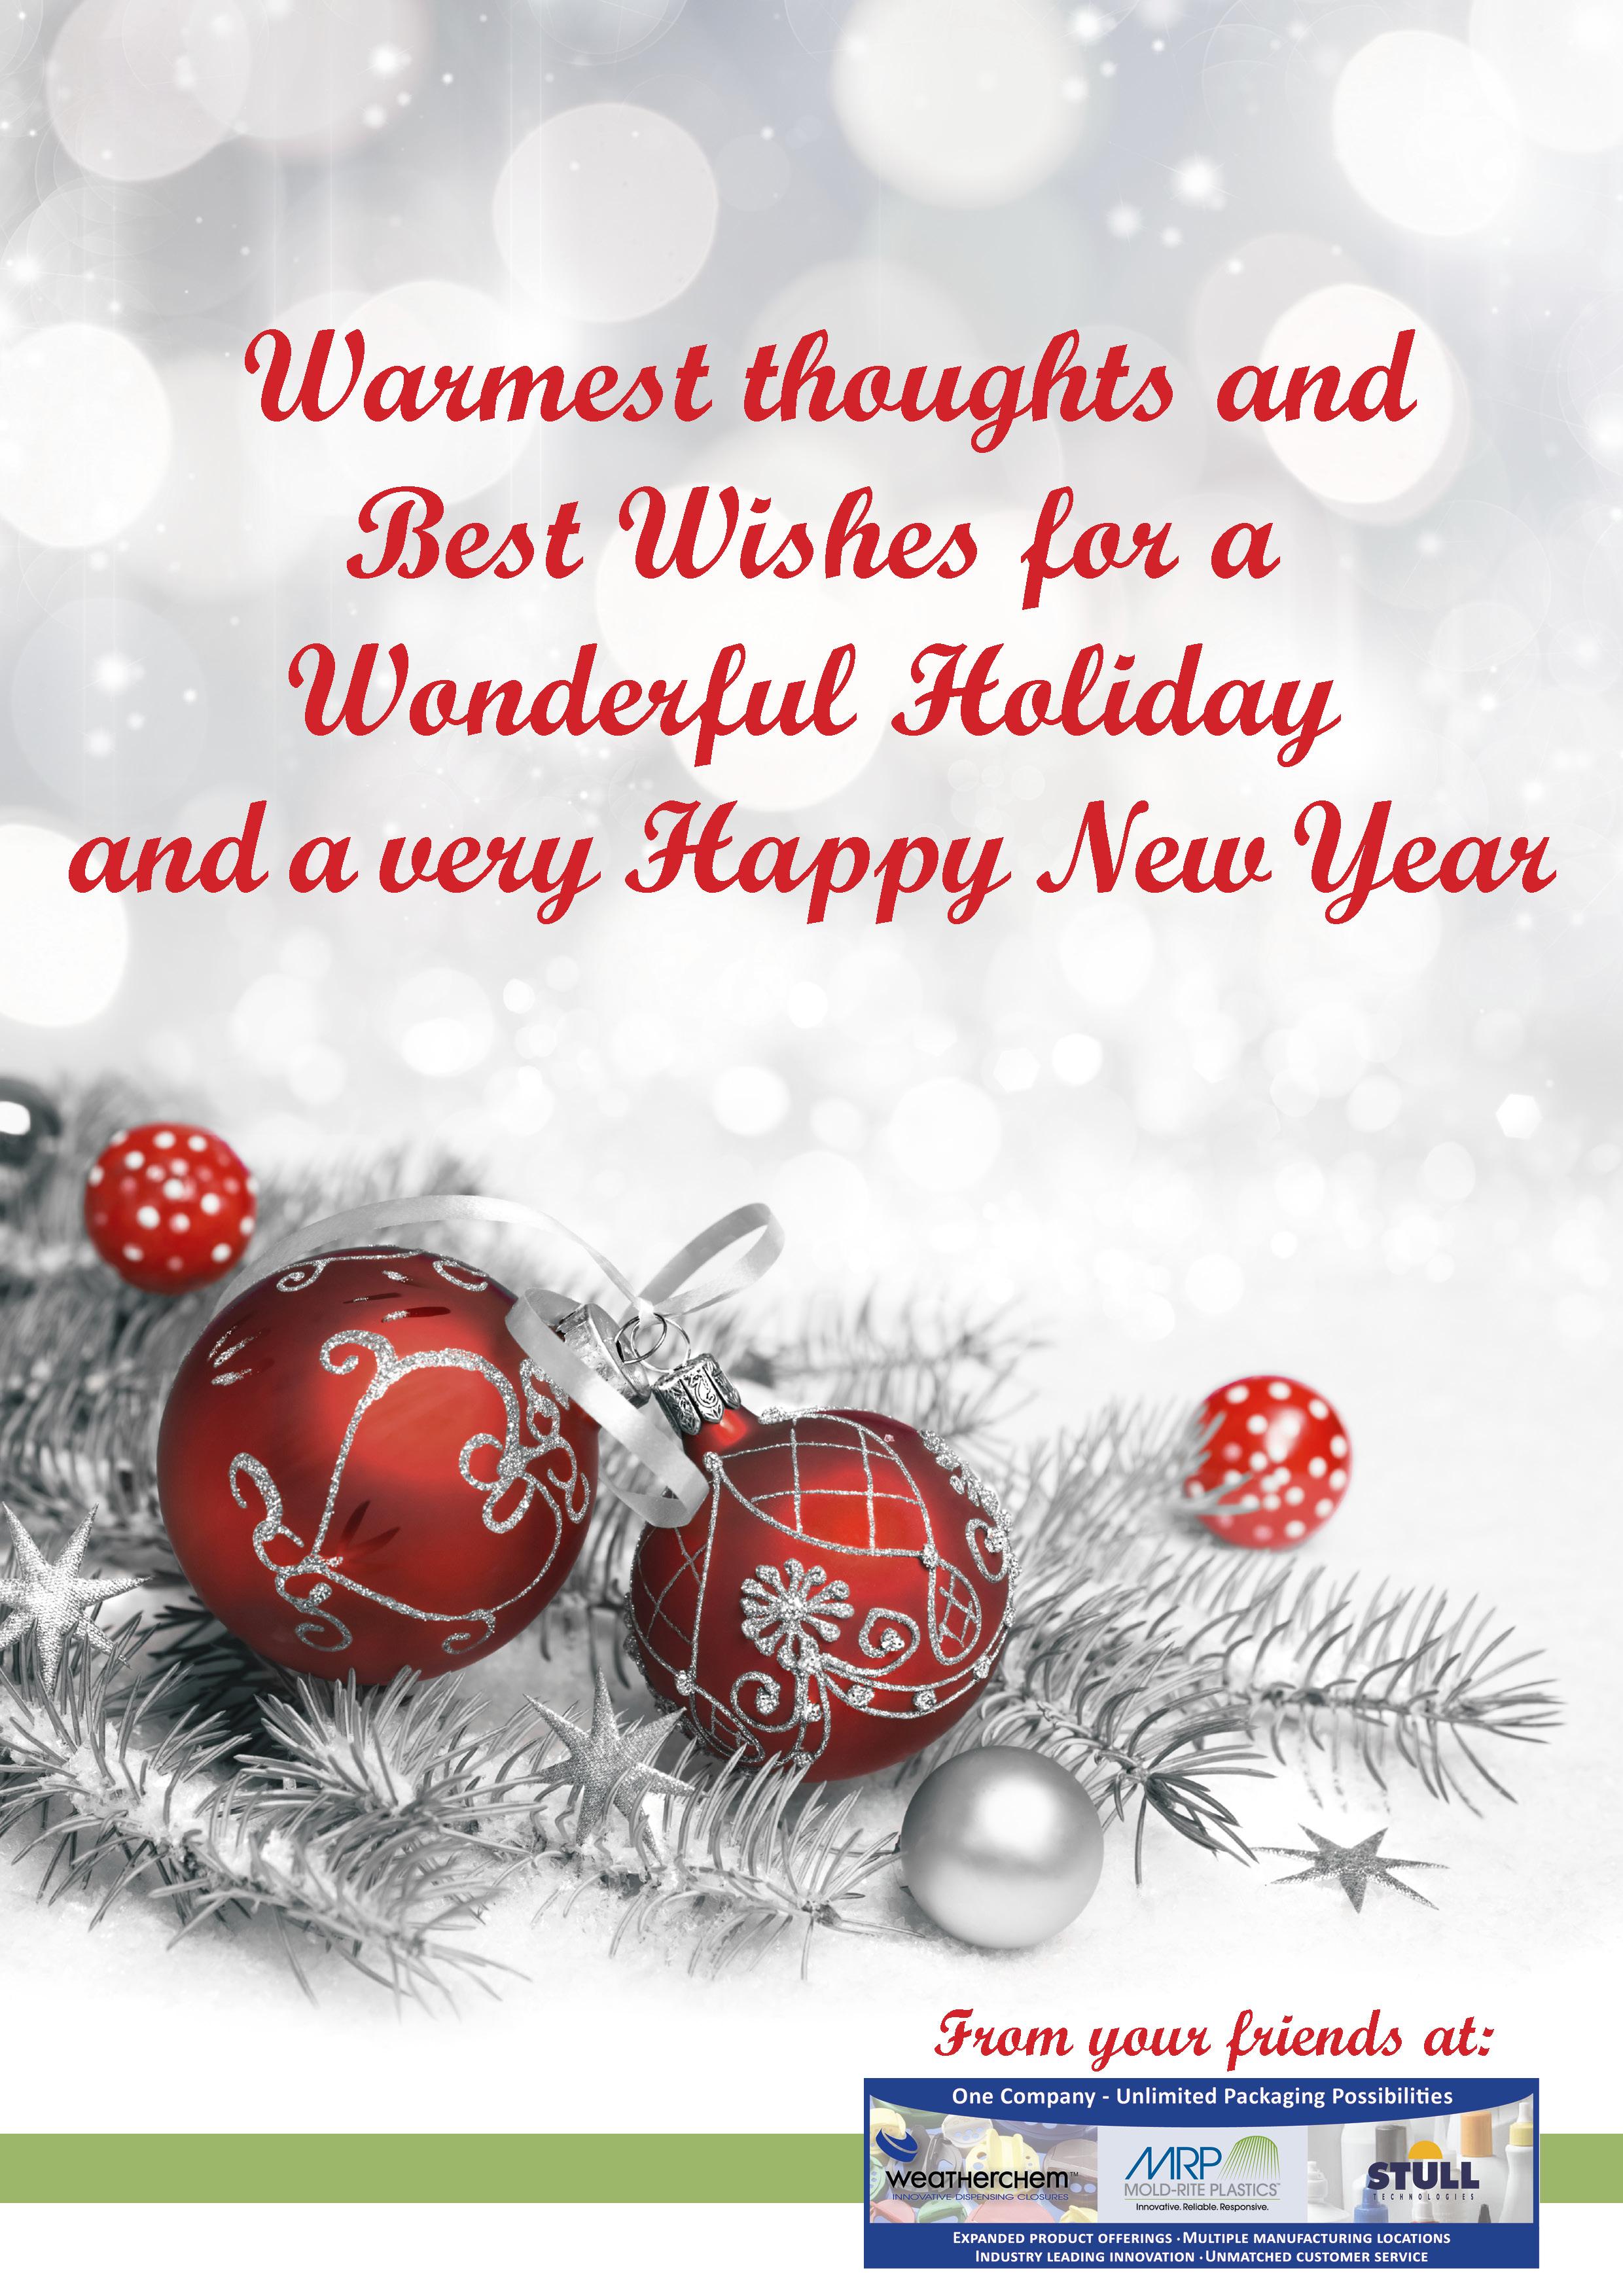 Happy Holidays from Mold-Rite Plastics